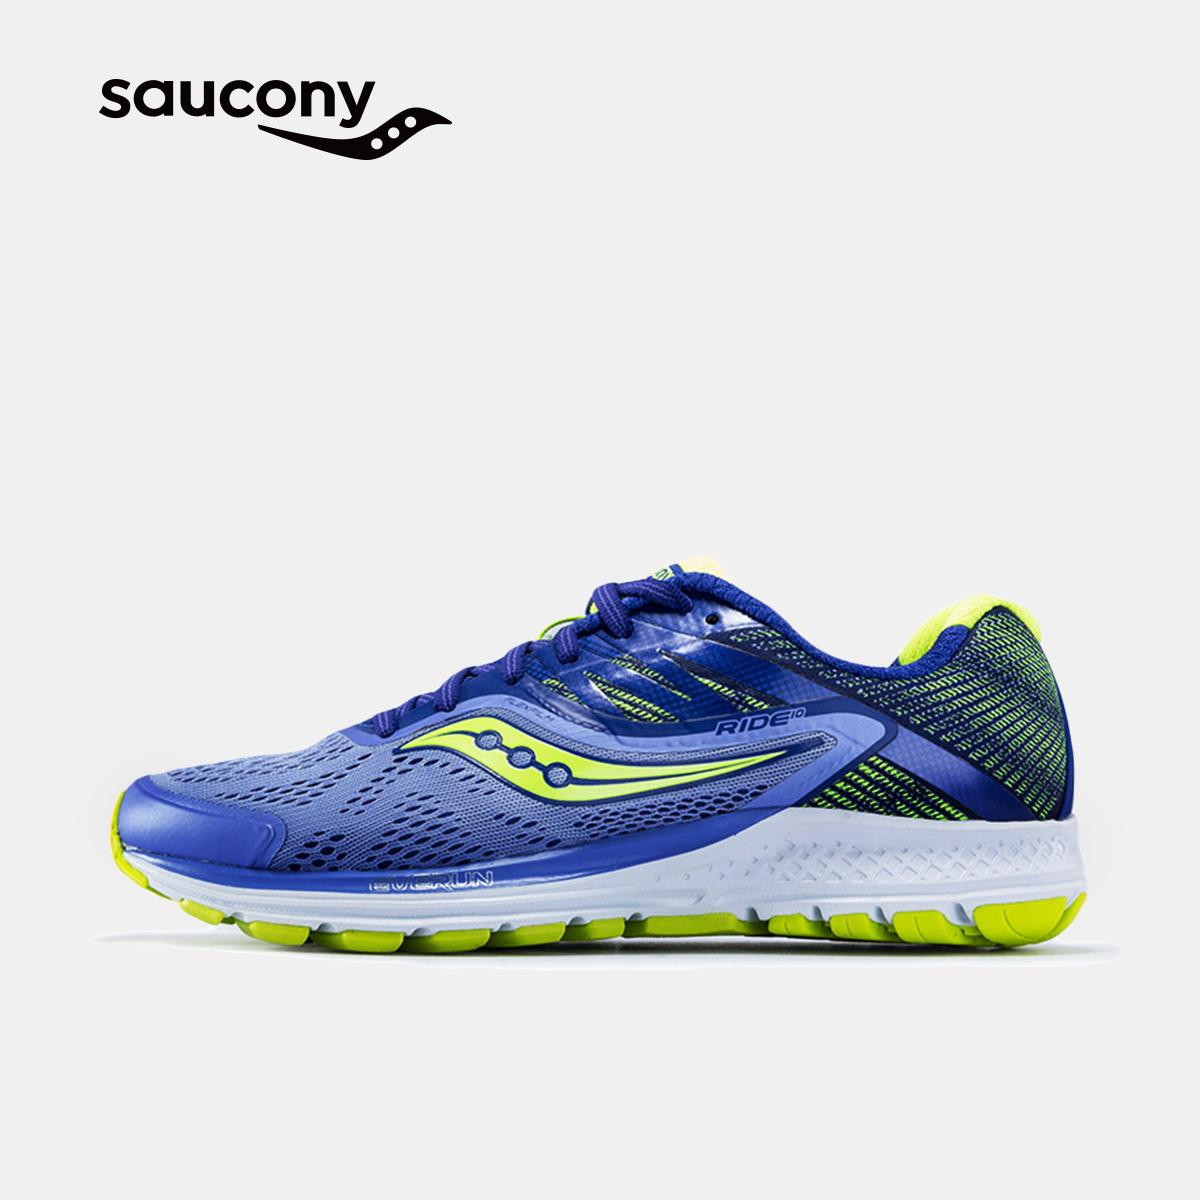 Saucony圣康尼RIDE 10春夏季缓震跑鞋运动鞋女子跑步鞋S10373